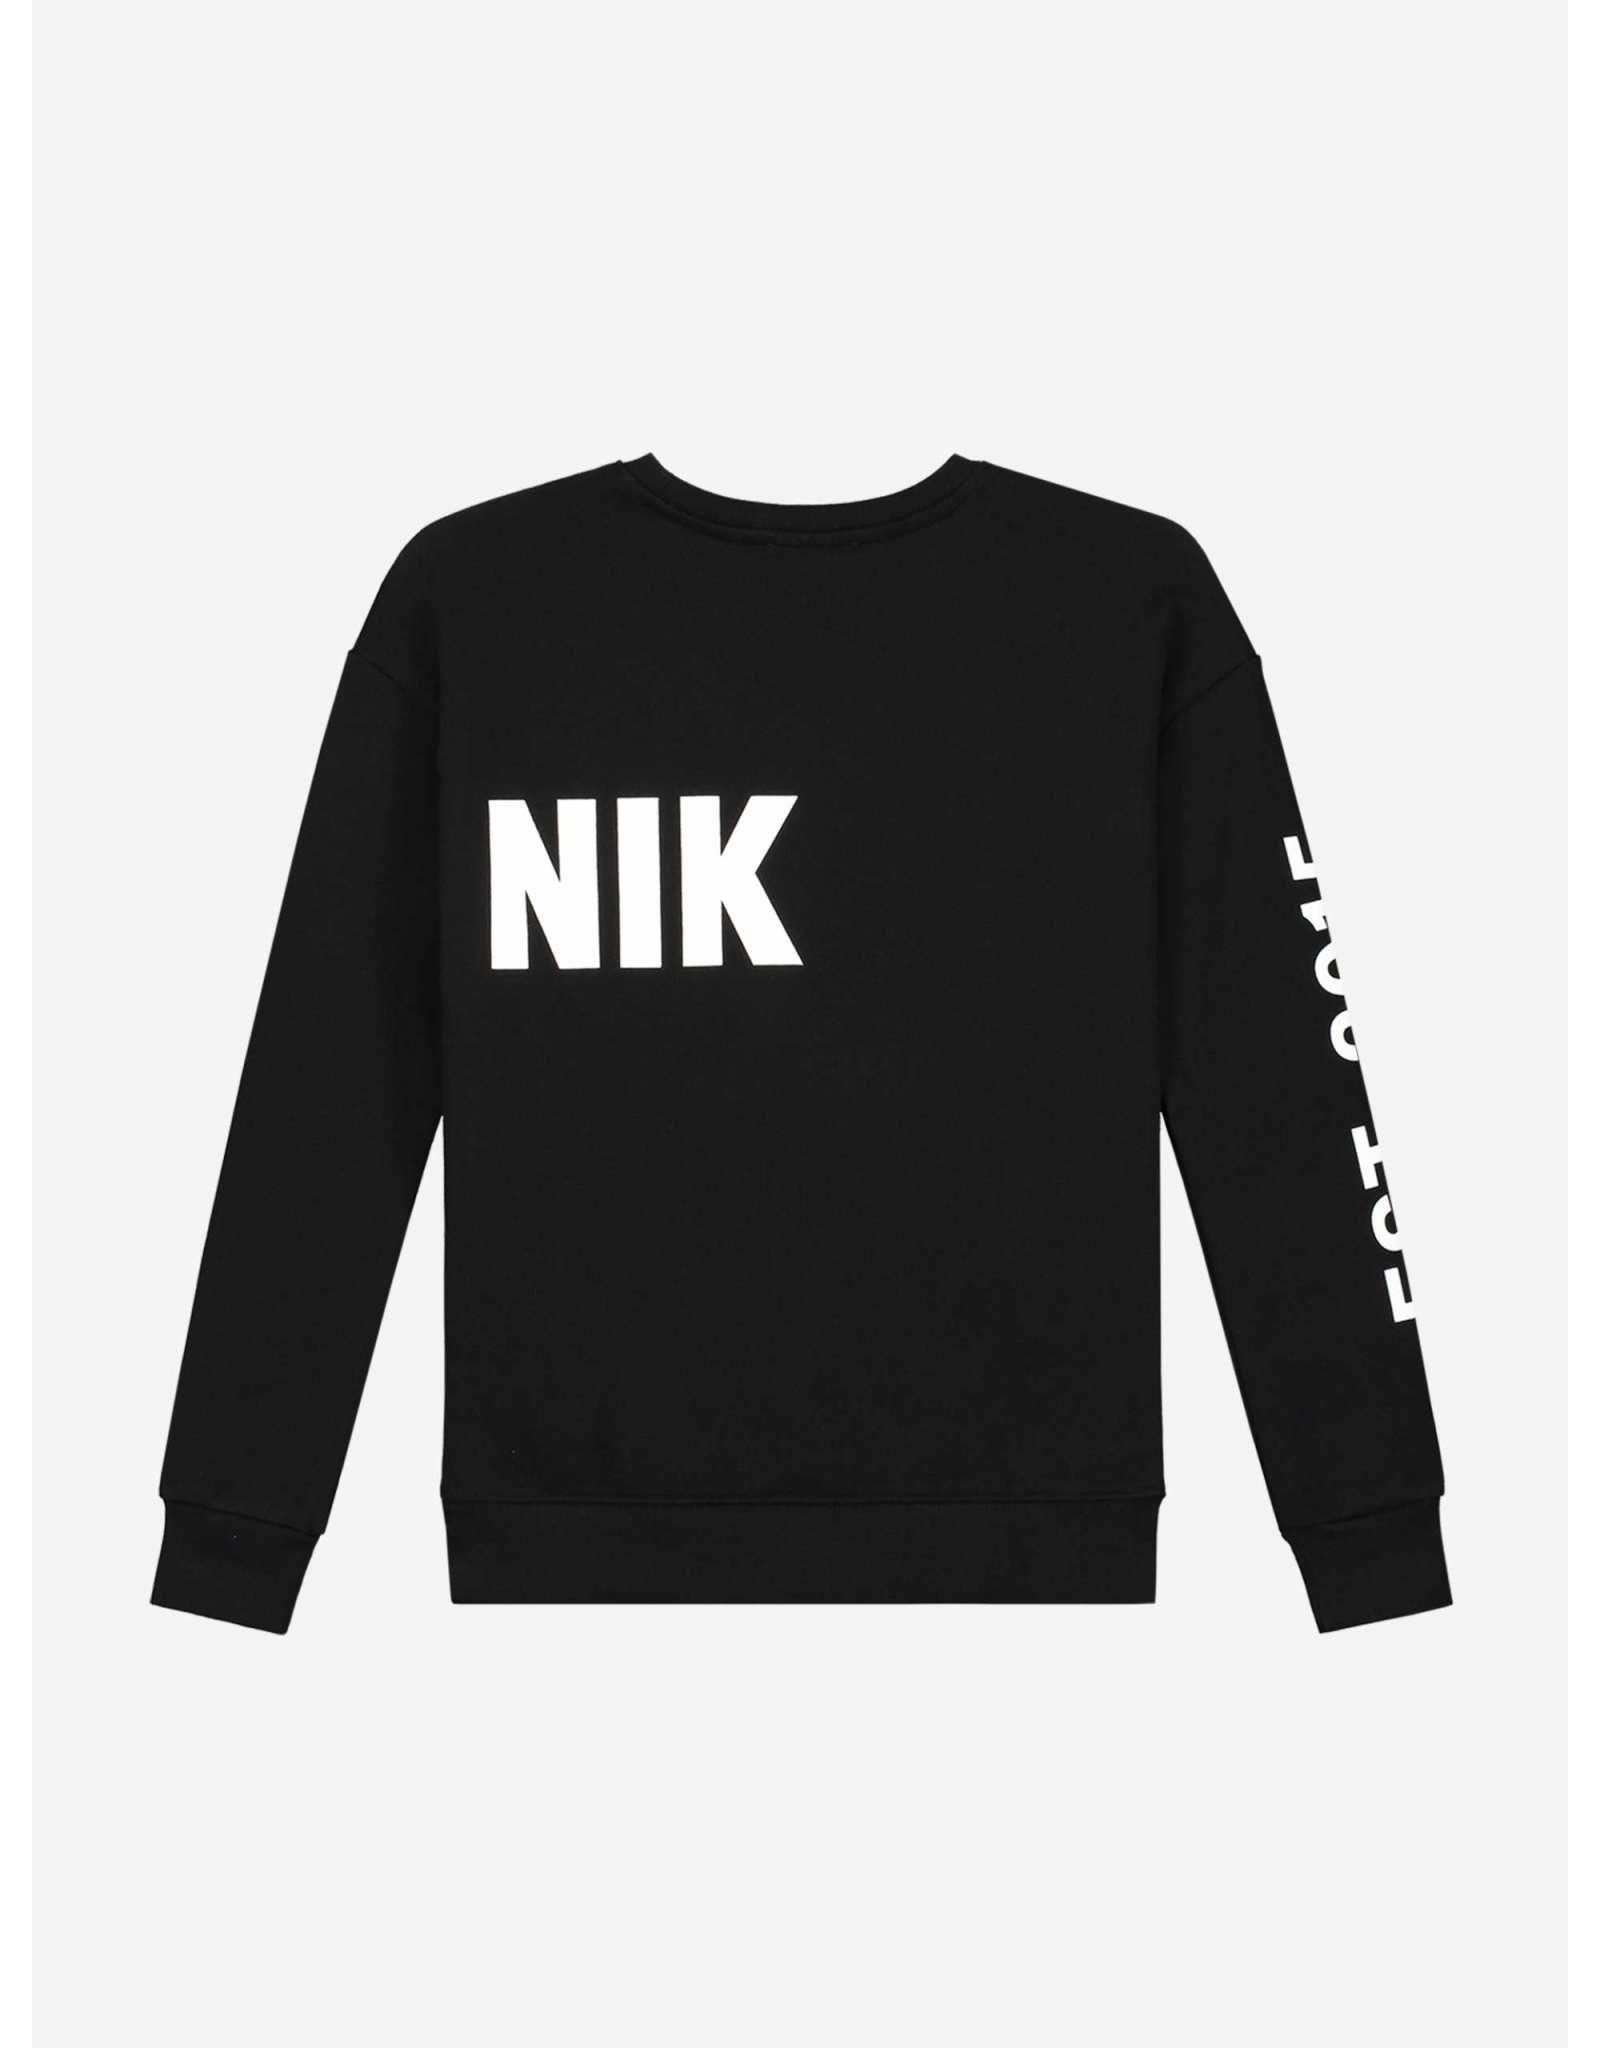 Nik & Nik Polly Nik&nik sweater